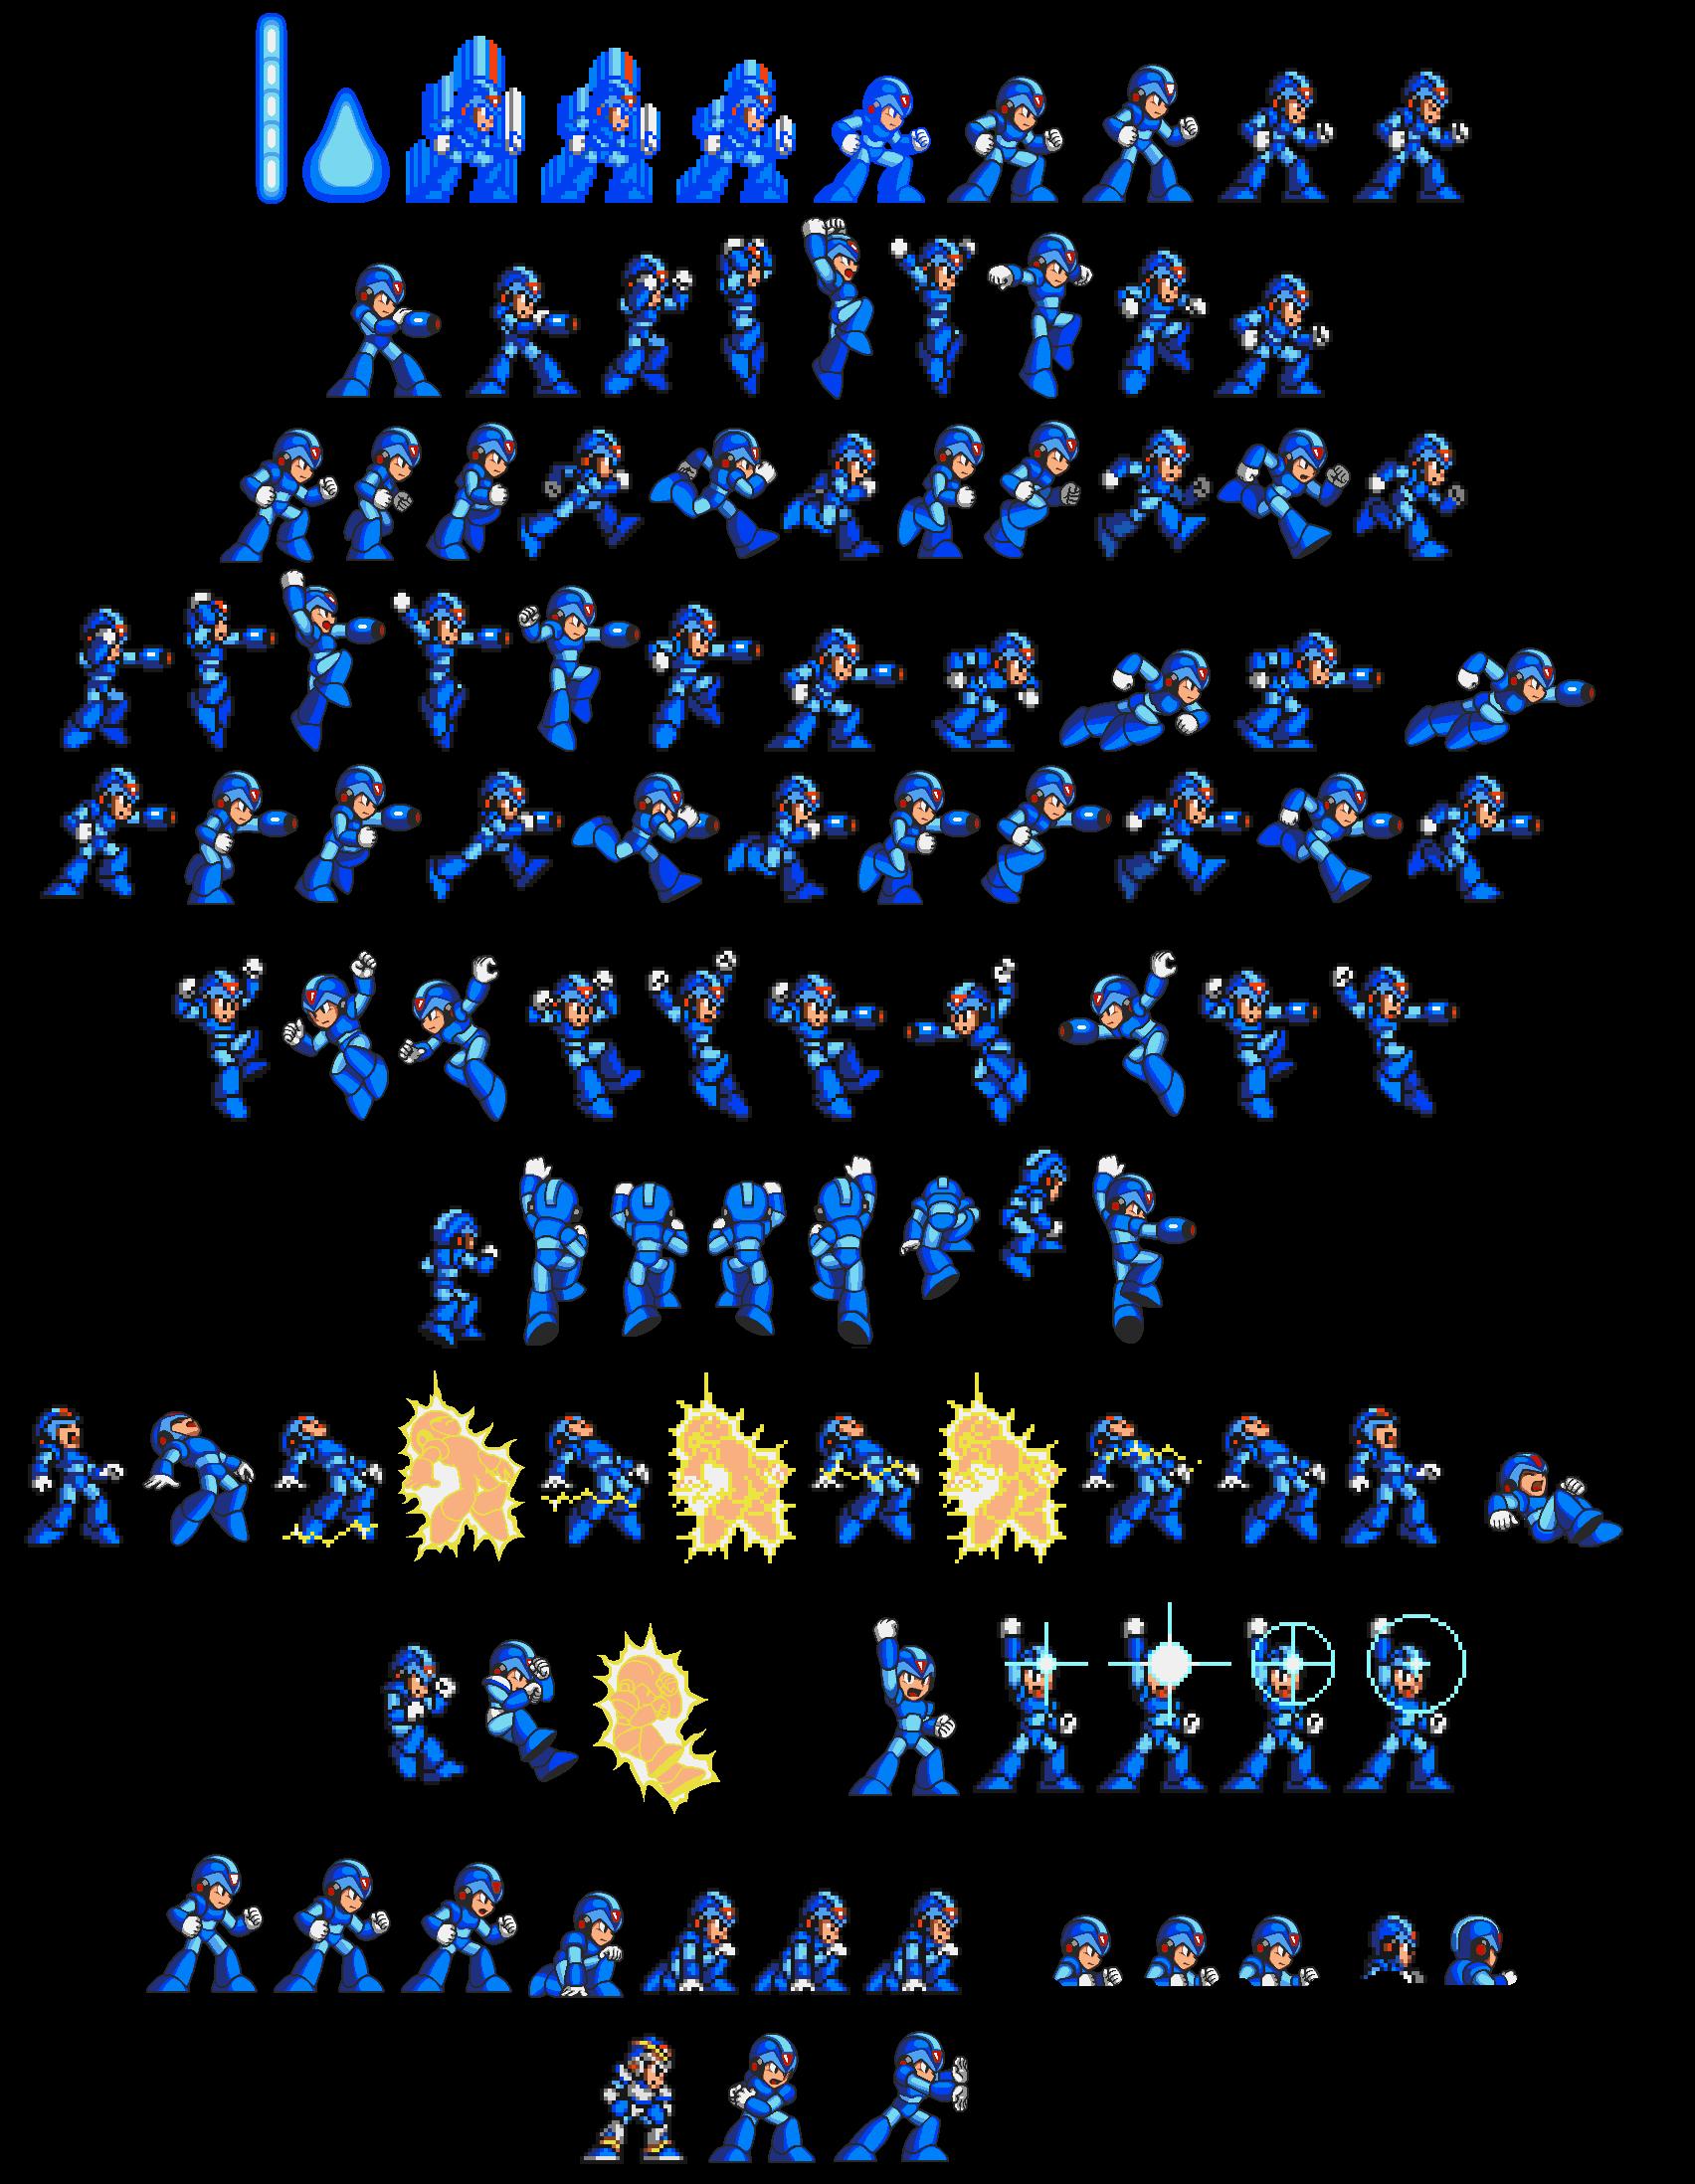 megaman x games list